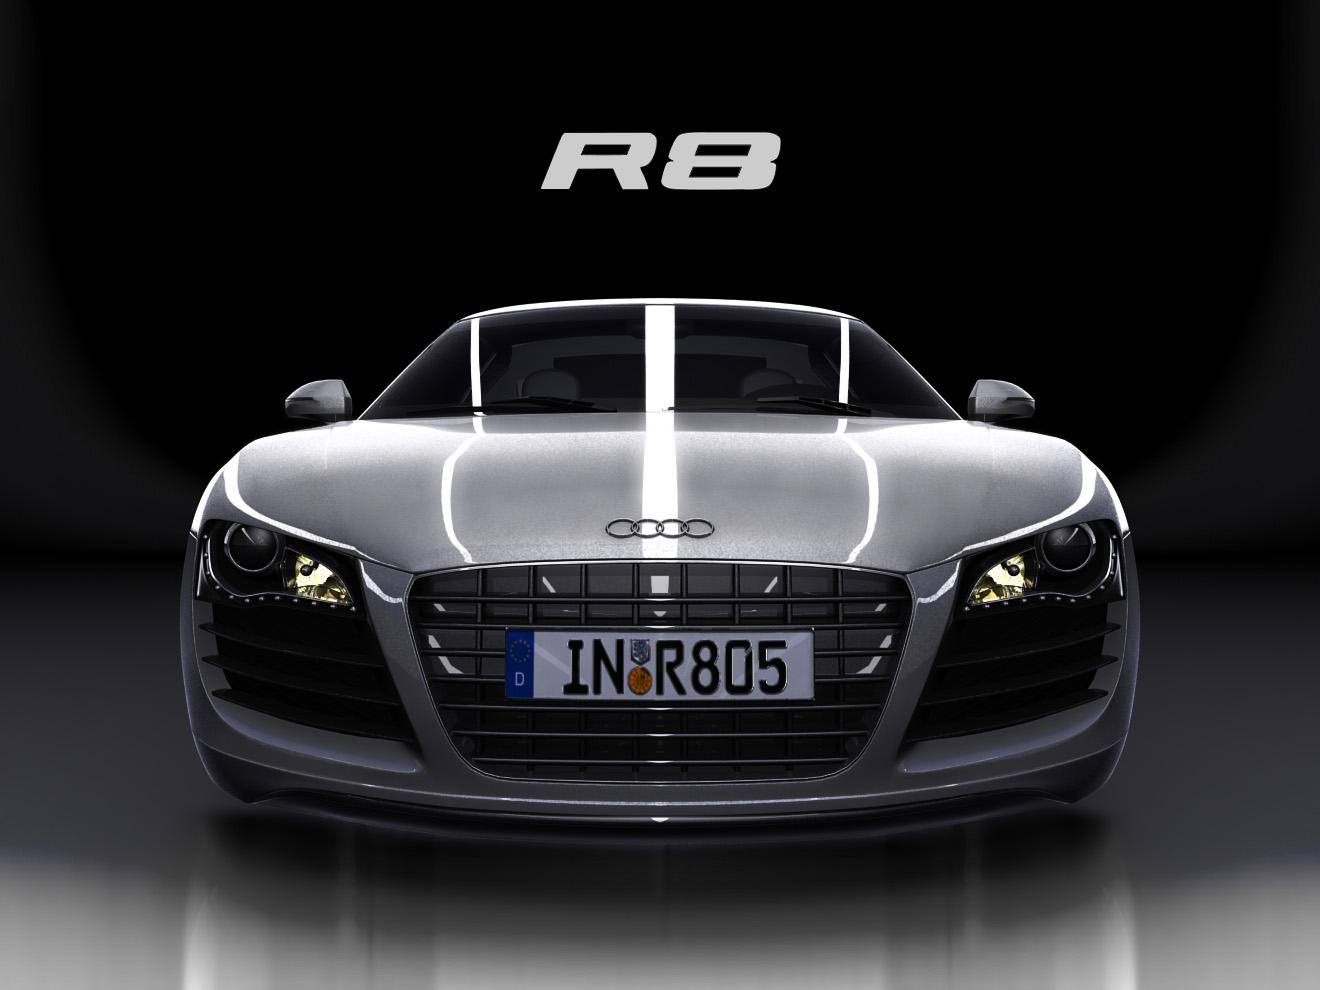 Wallpaperanimallove 2012 Audi R18 Wallpaper